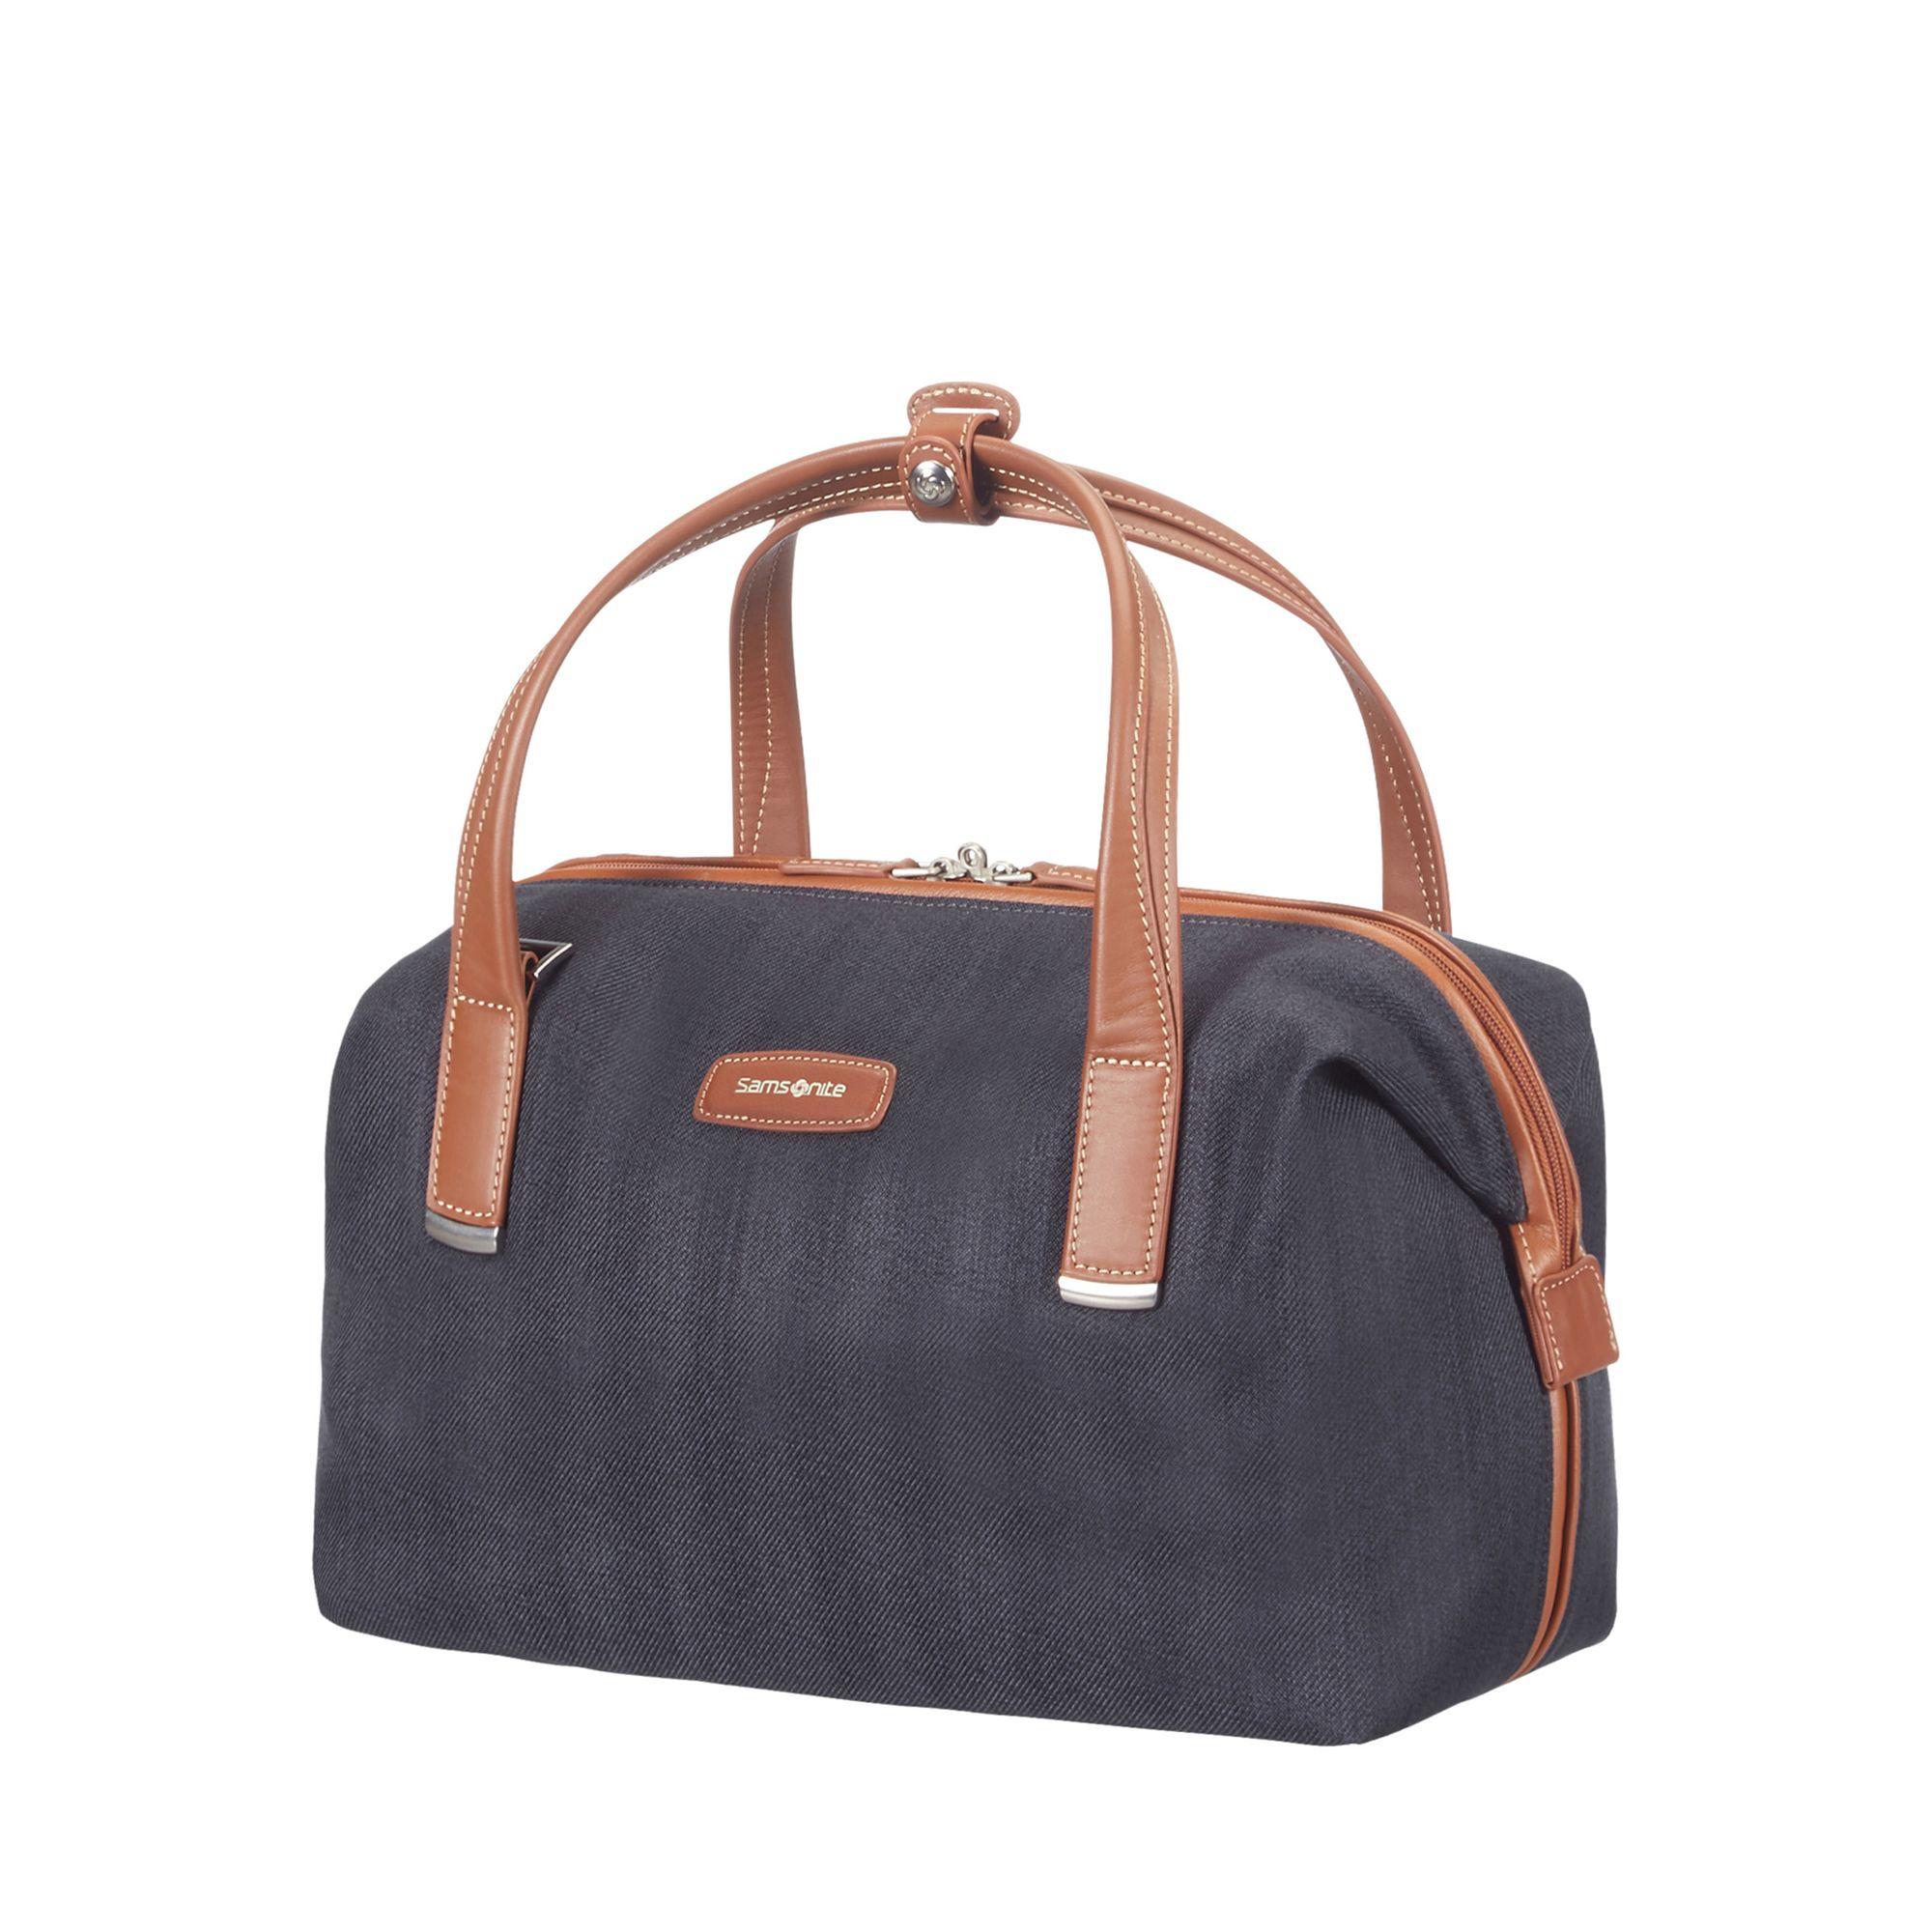 Samsonite Lite DLX väska, 13 liter, Blå